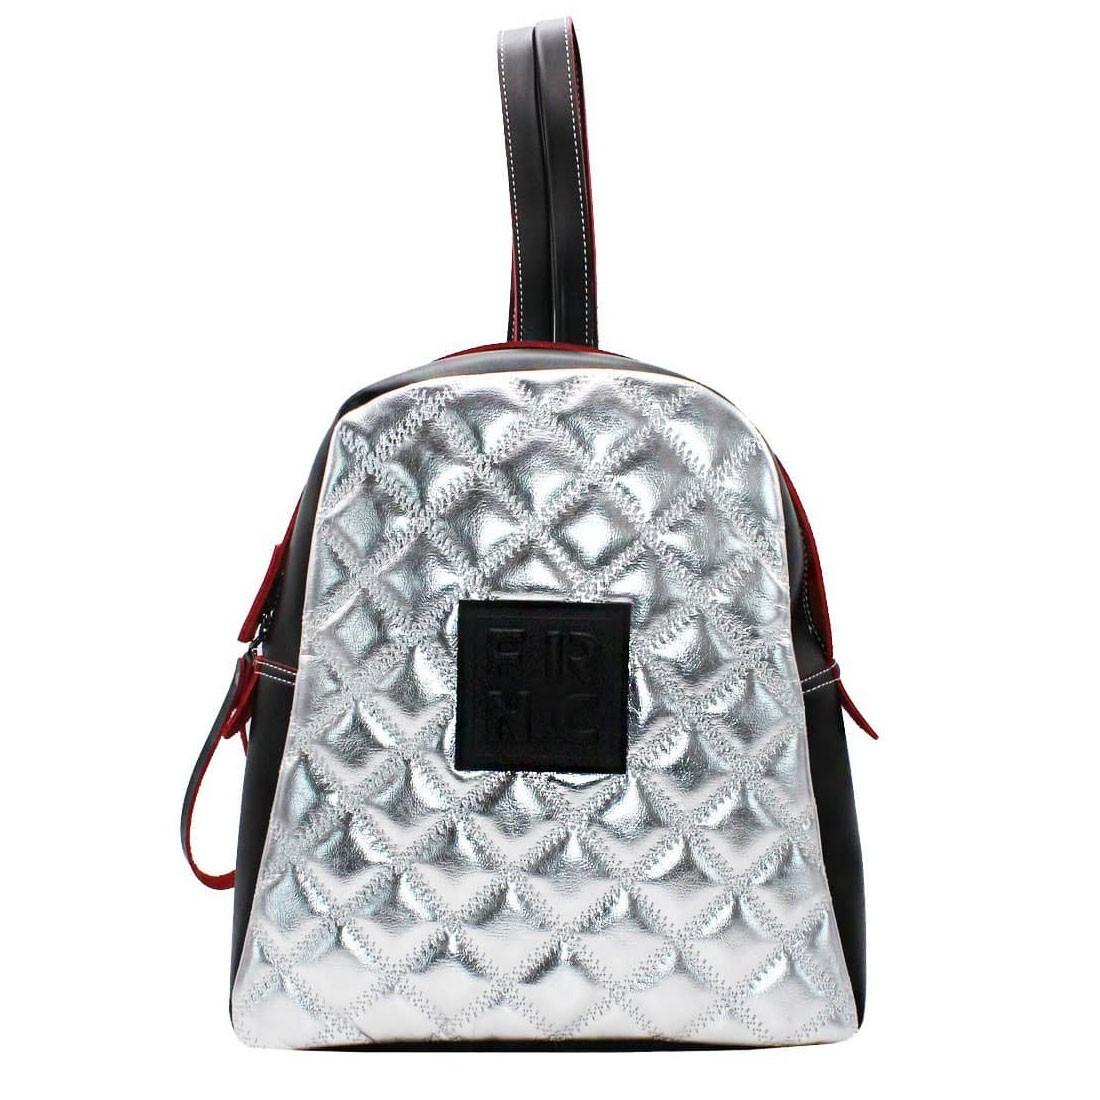 3c790f92c9 FRNC FRANCESCO Τσάντα Γυναικεία Πλάτης-Backpack 1202 Μαύρο-Ασημί ...